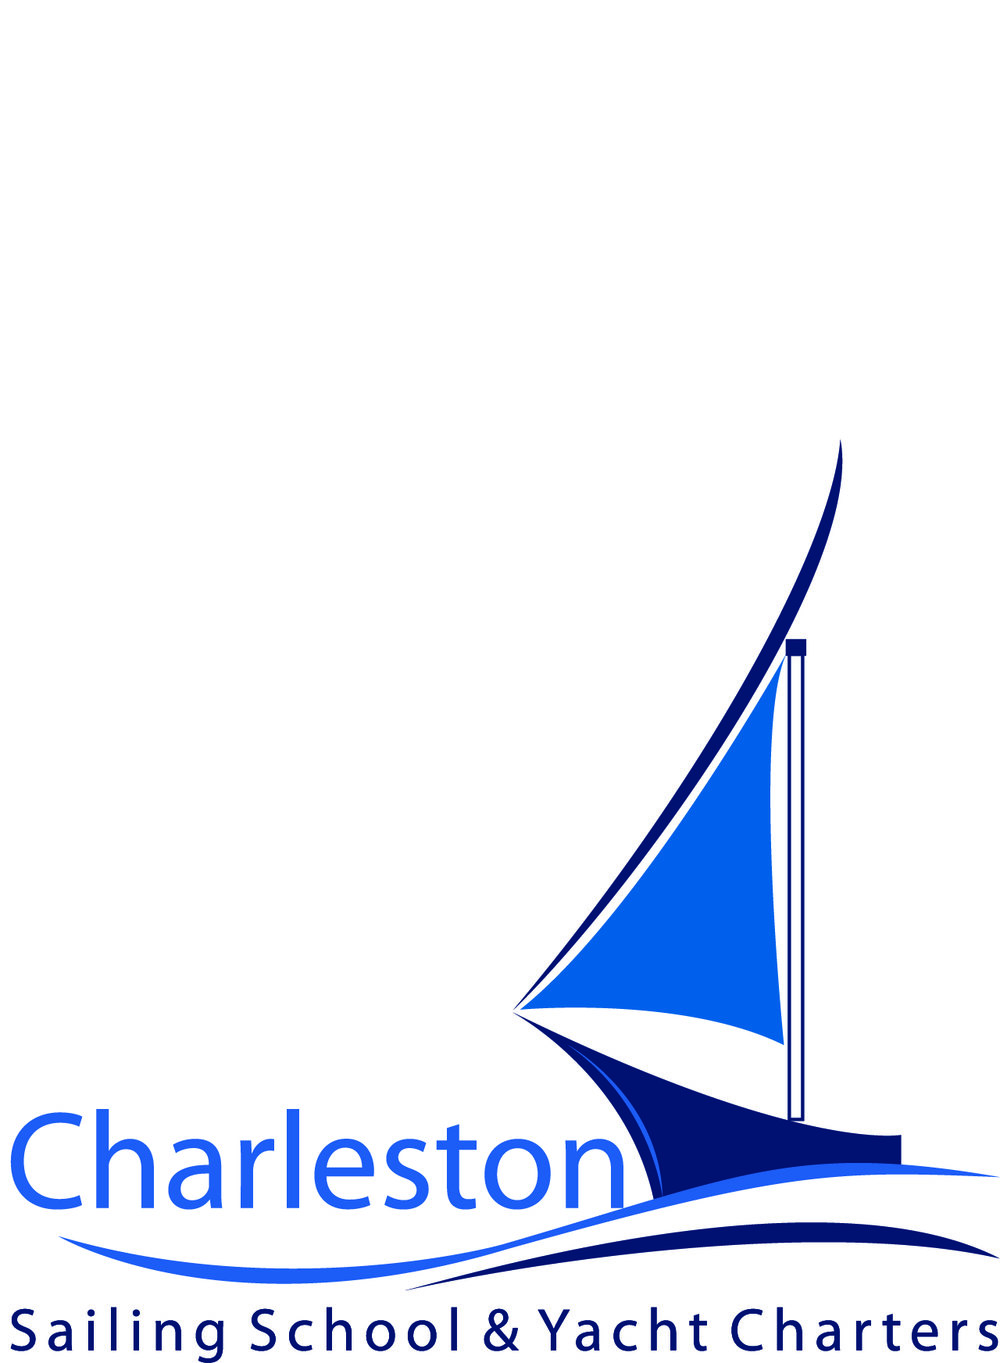 CharlestonSailingSchoolLogo.jpg